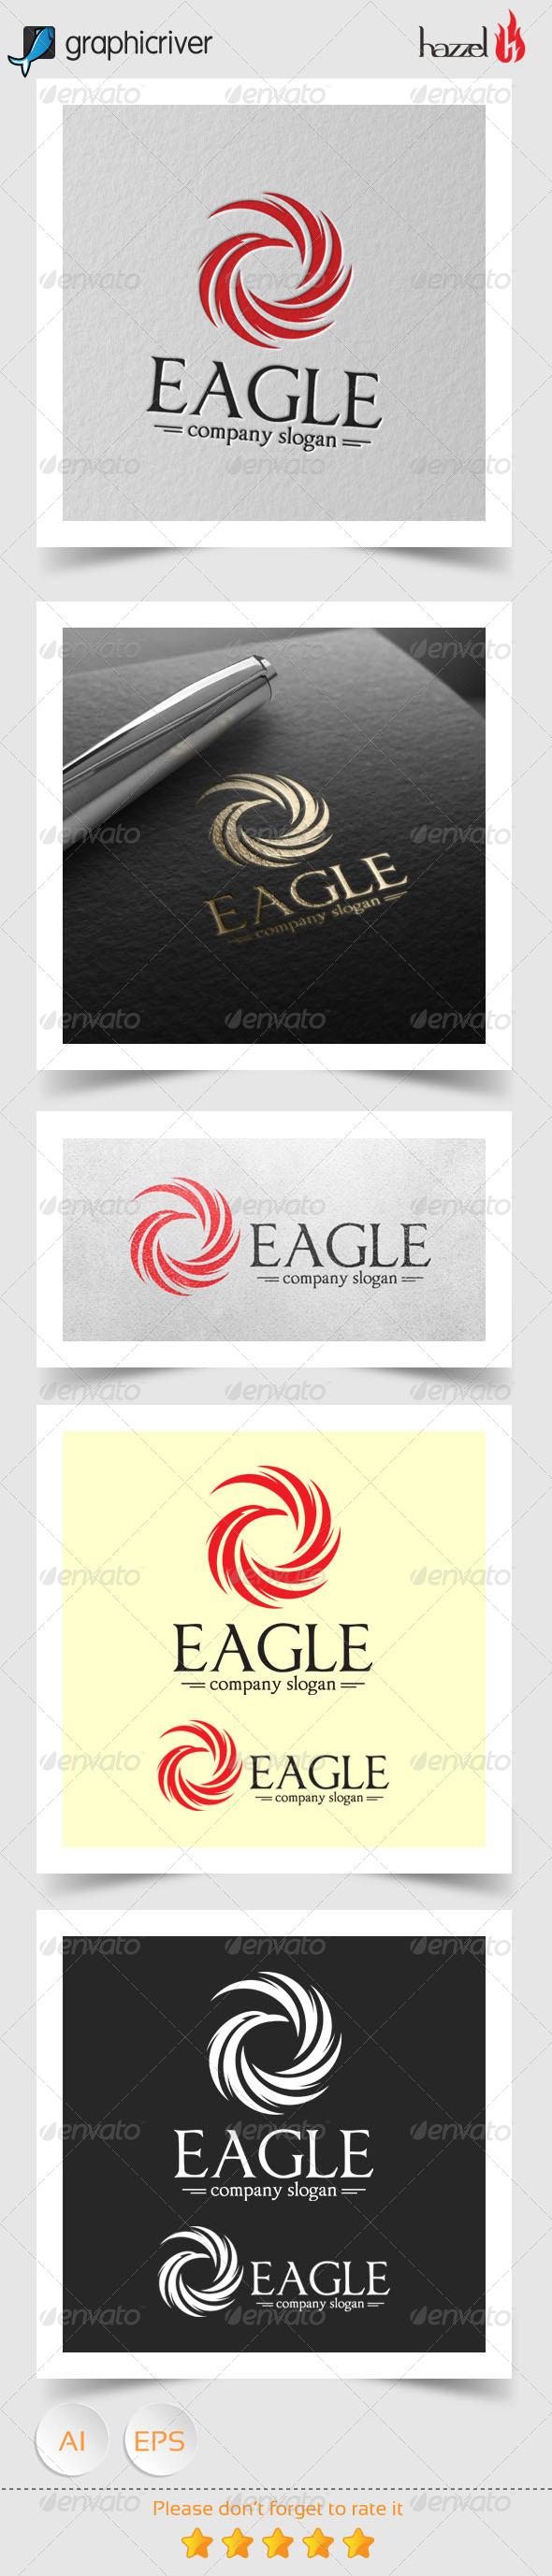 GraphicRiver Eagle Logo 8146056